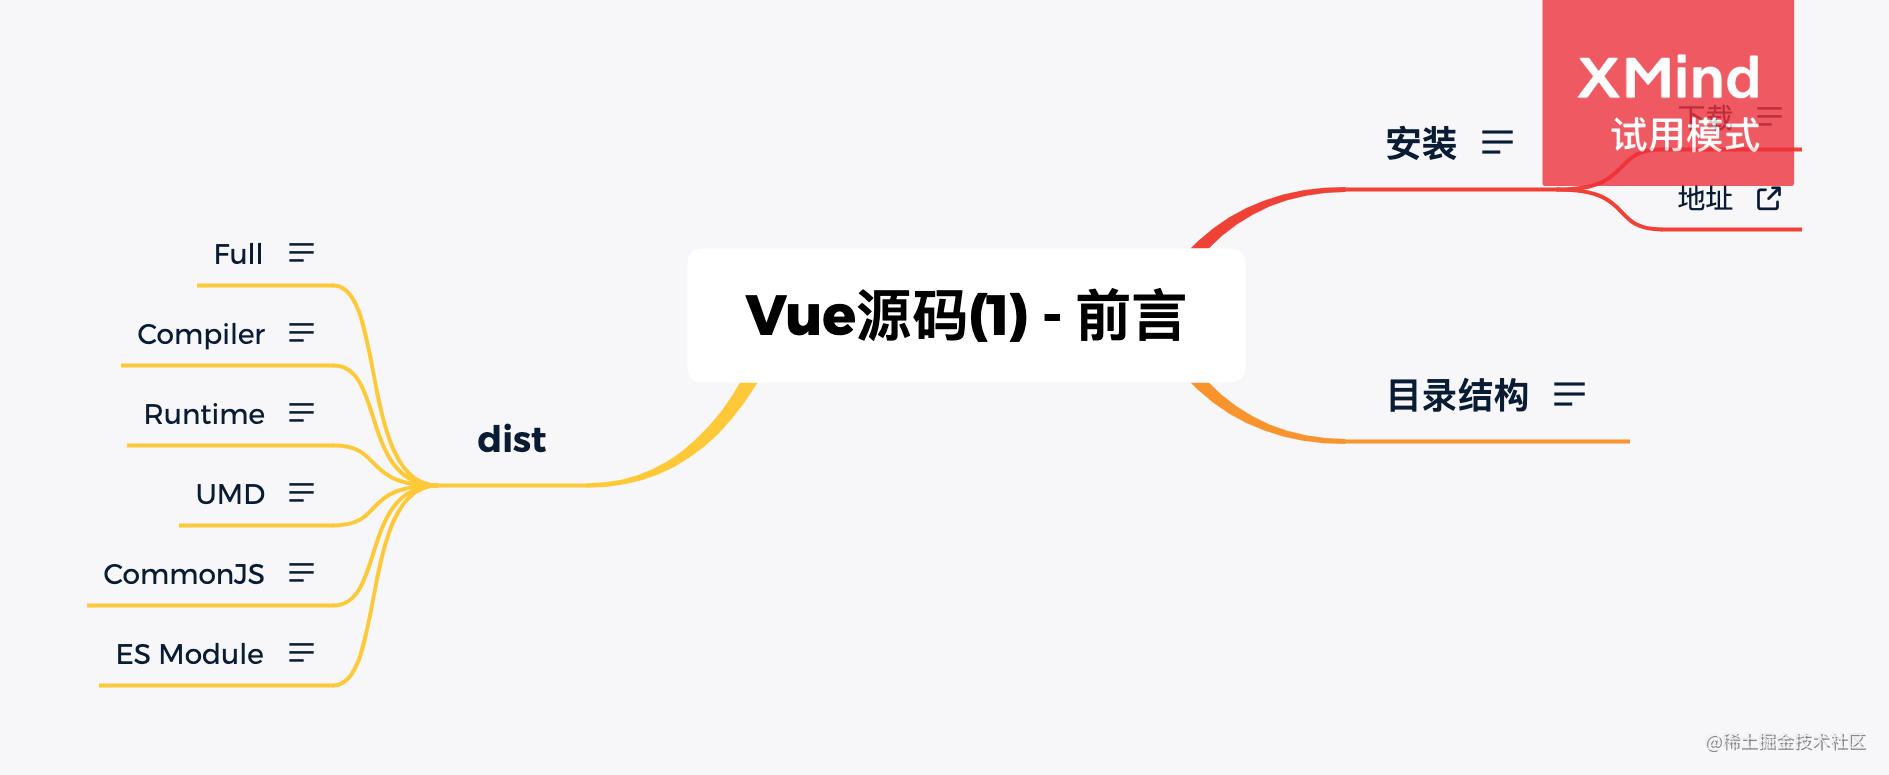 Vue源码(1) - 前言.png